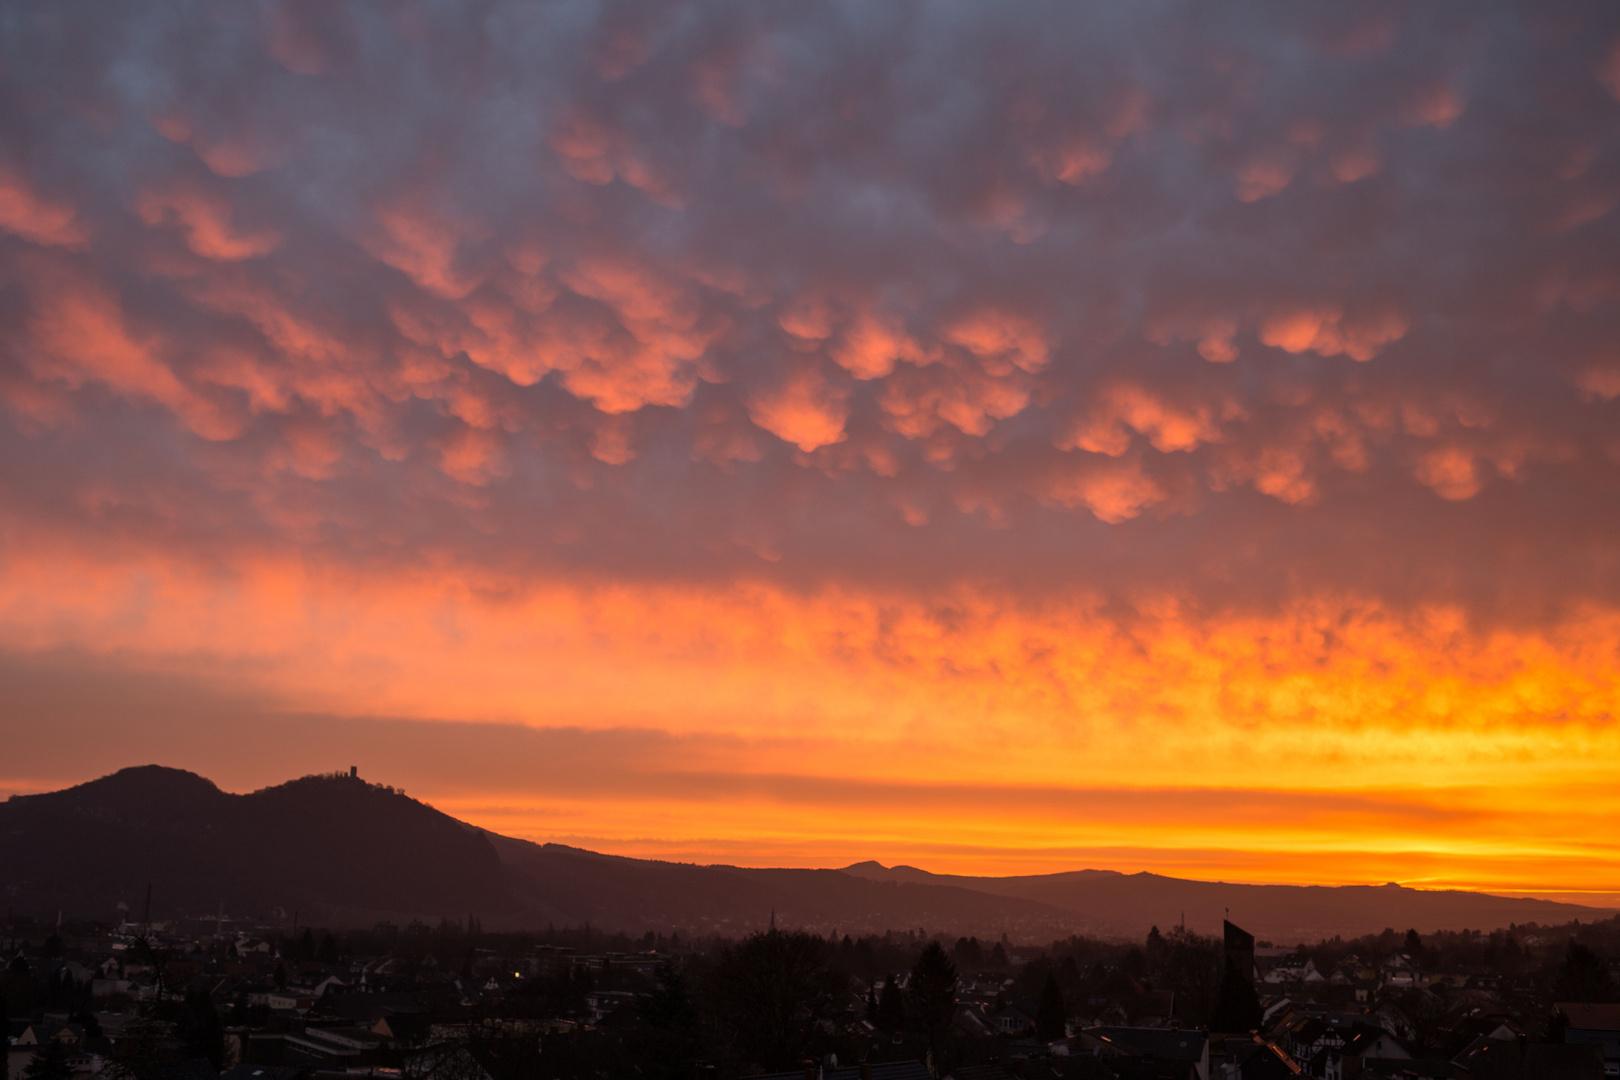 Skyline über Siebengebirge